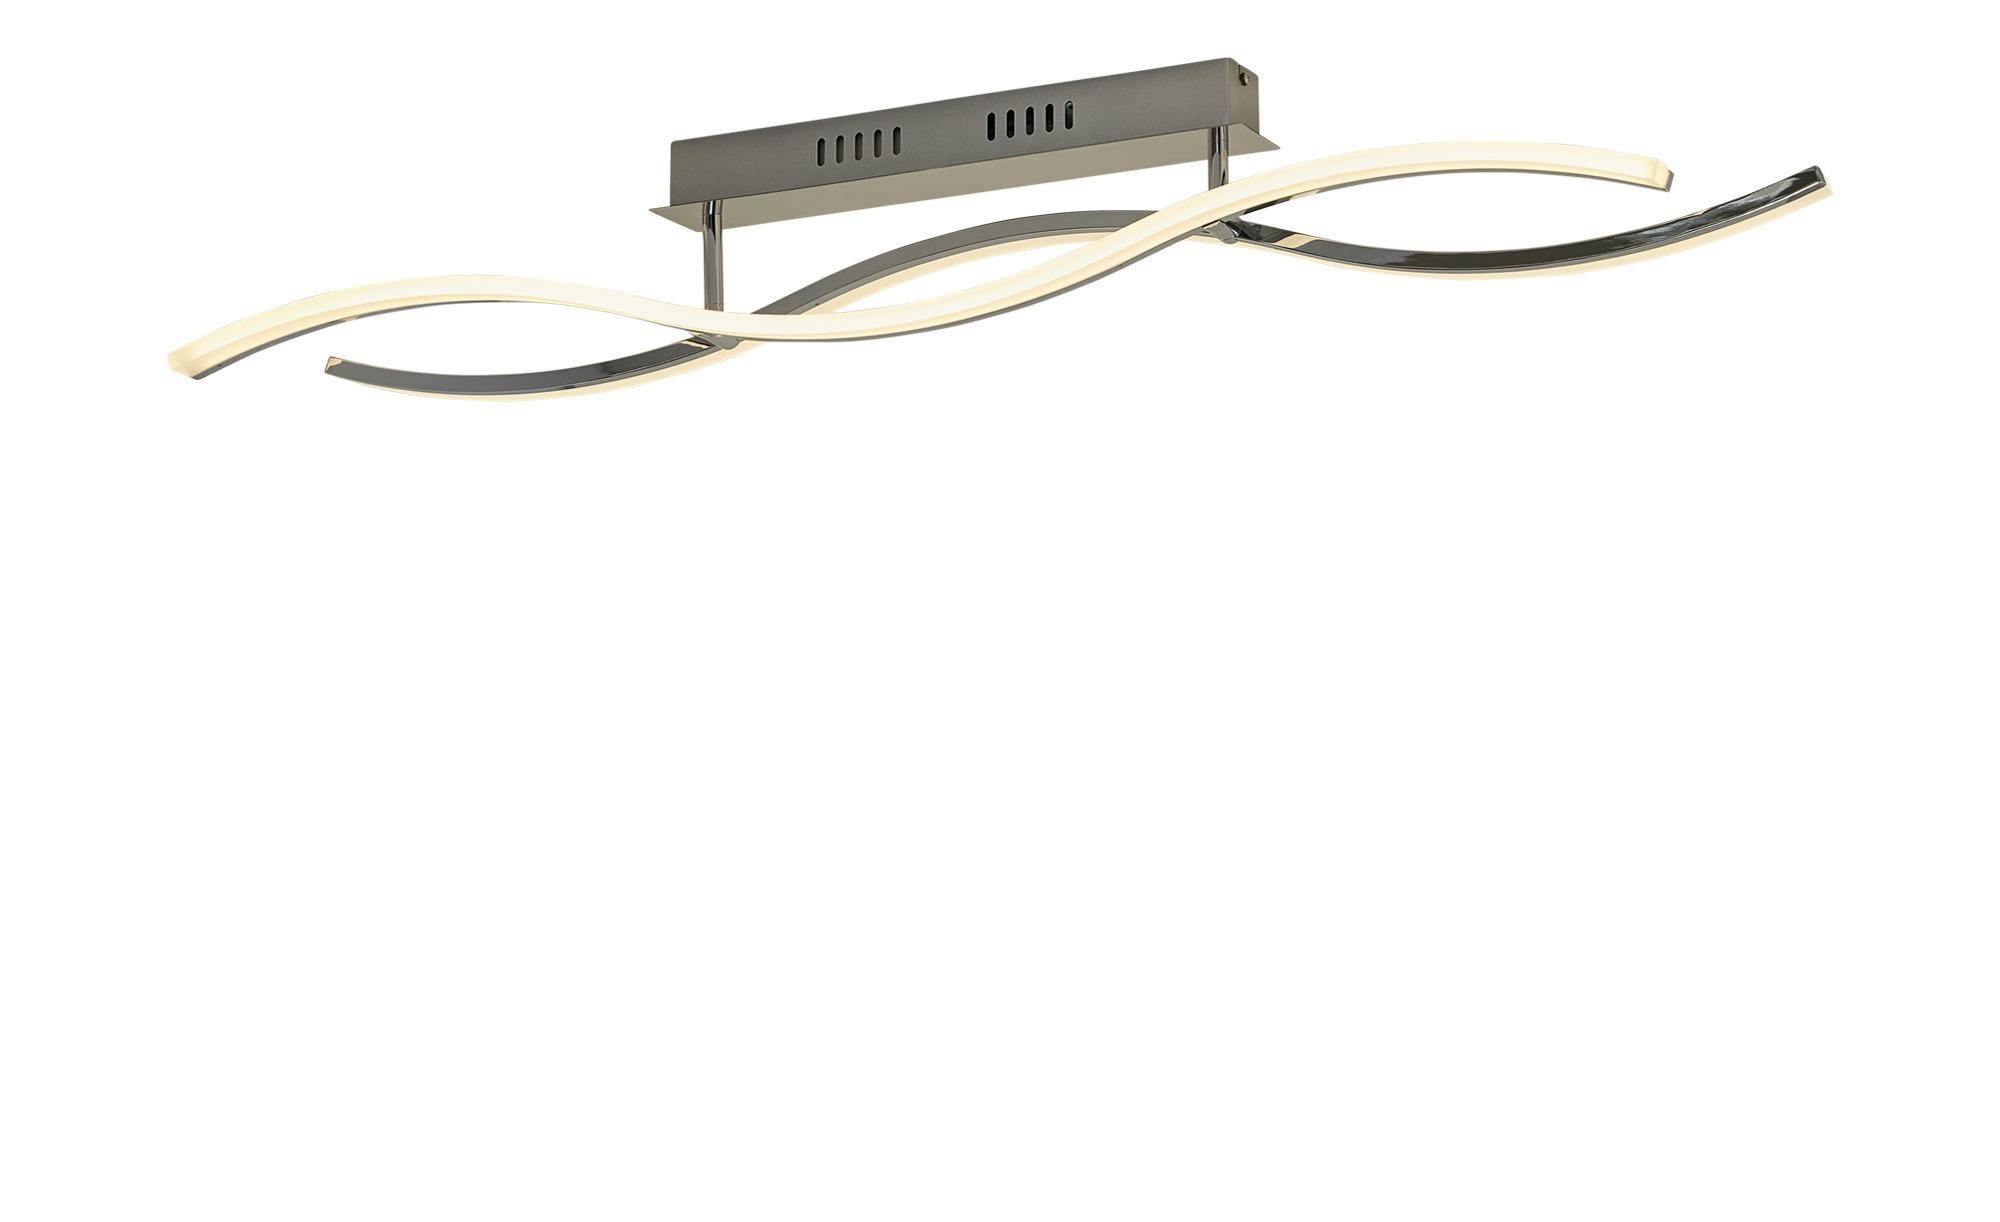 KHG LED-Deckenleuchte, chrom `Wavy` ¦ silber ¦ Maße (cm): B: 11 H: 15 Lampen & Leuchten > Innenleuchten > Deckenleuchten - Höffner